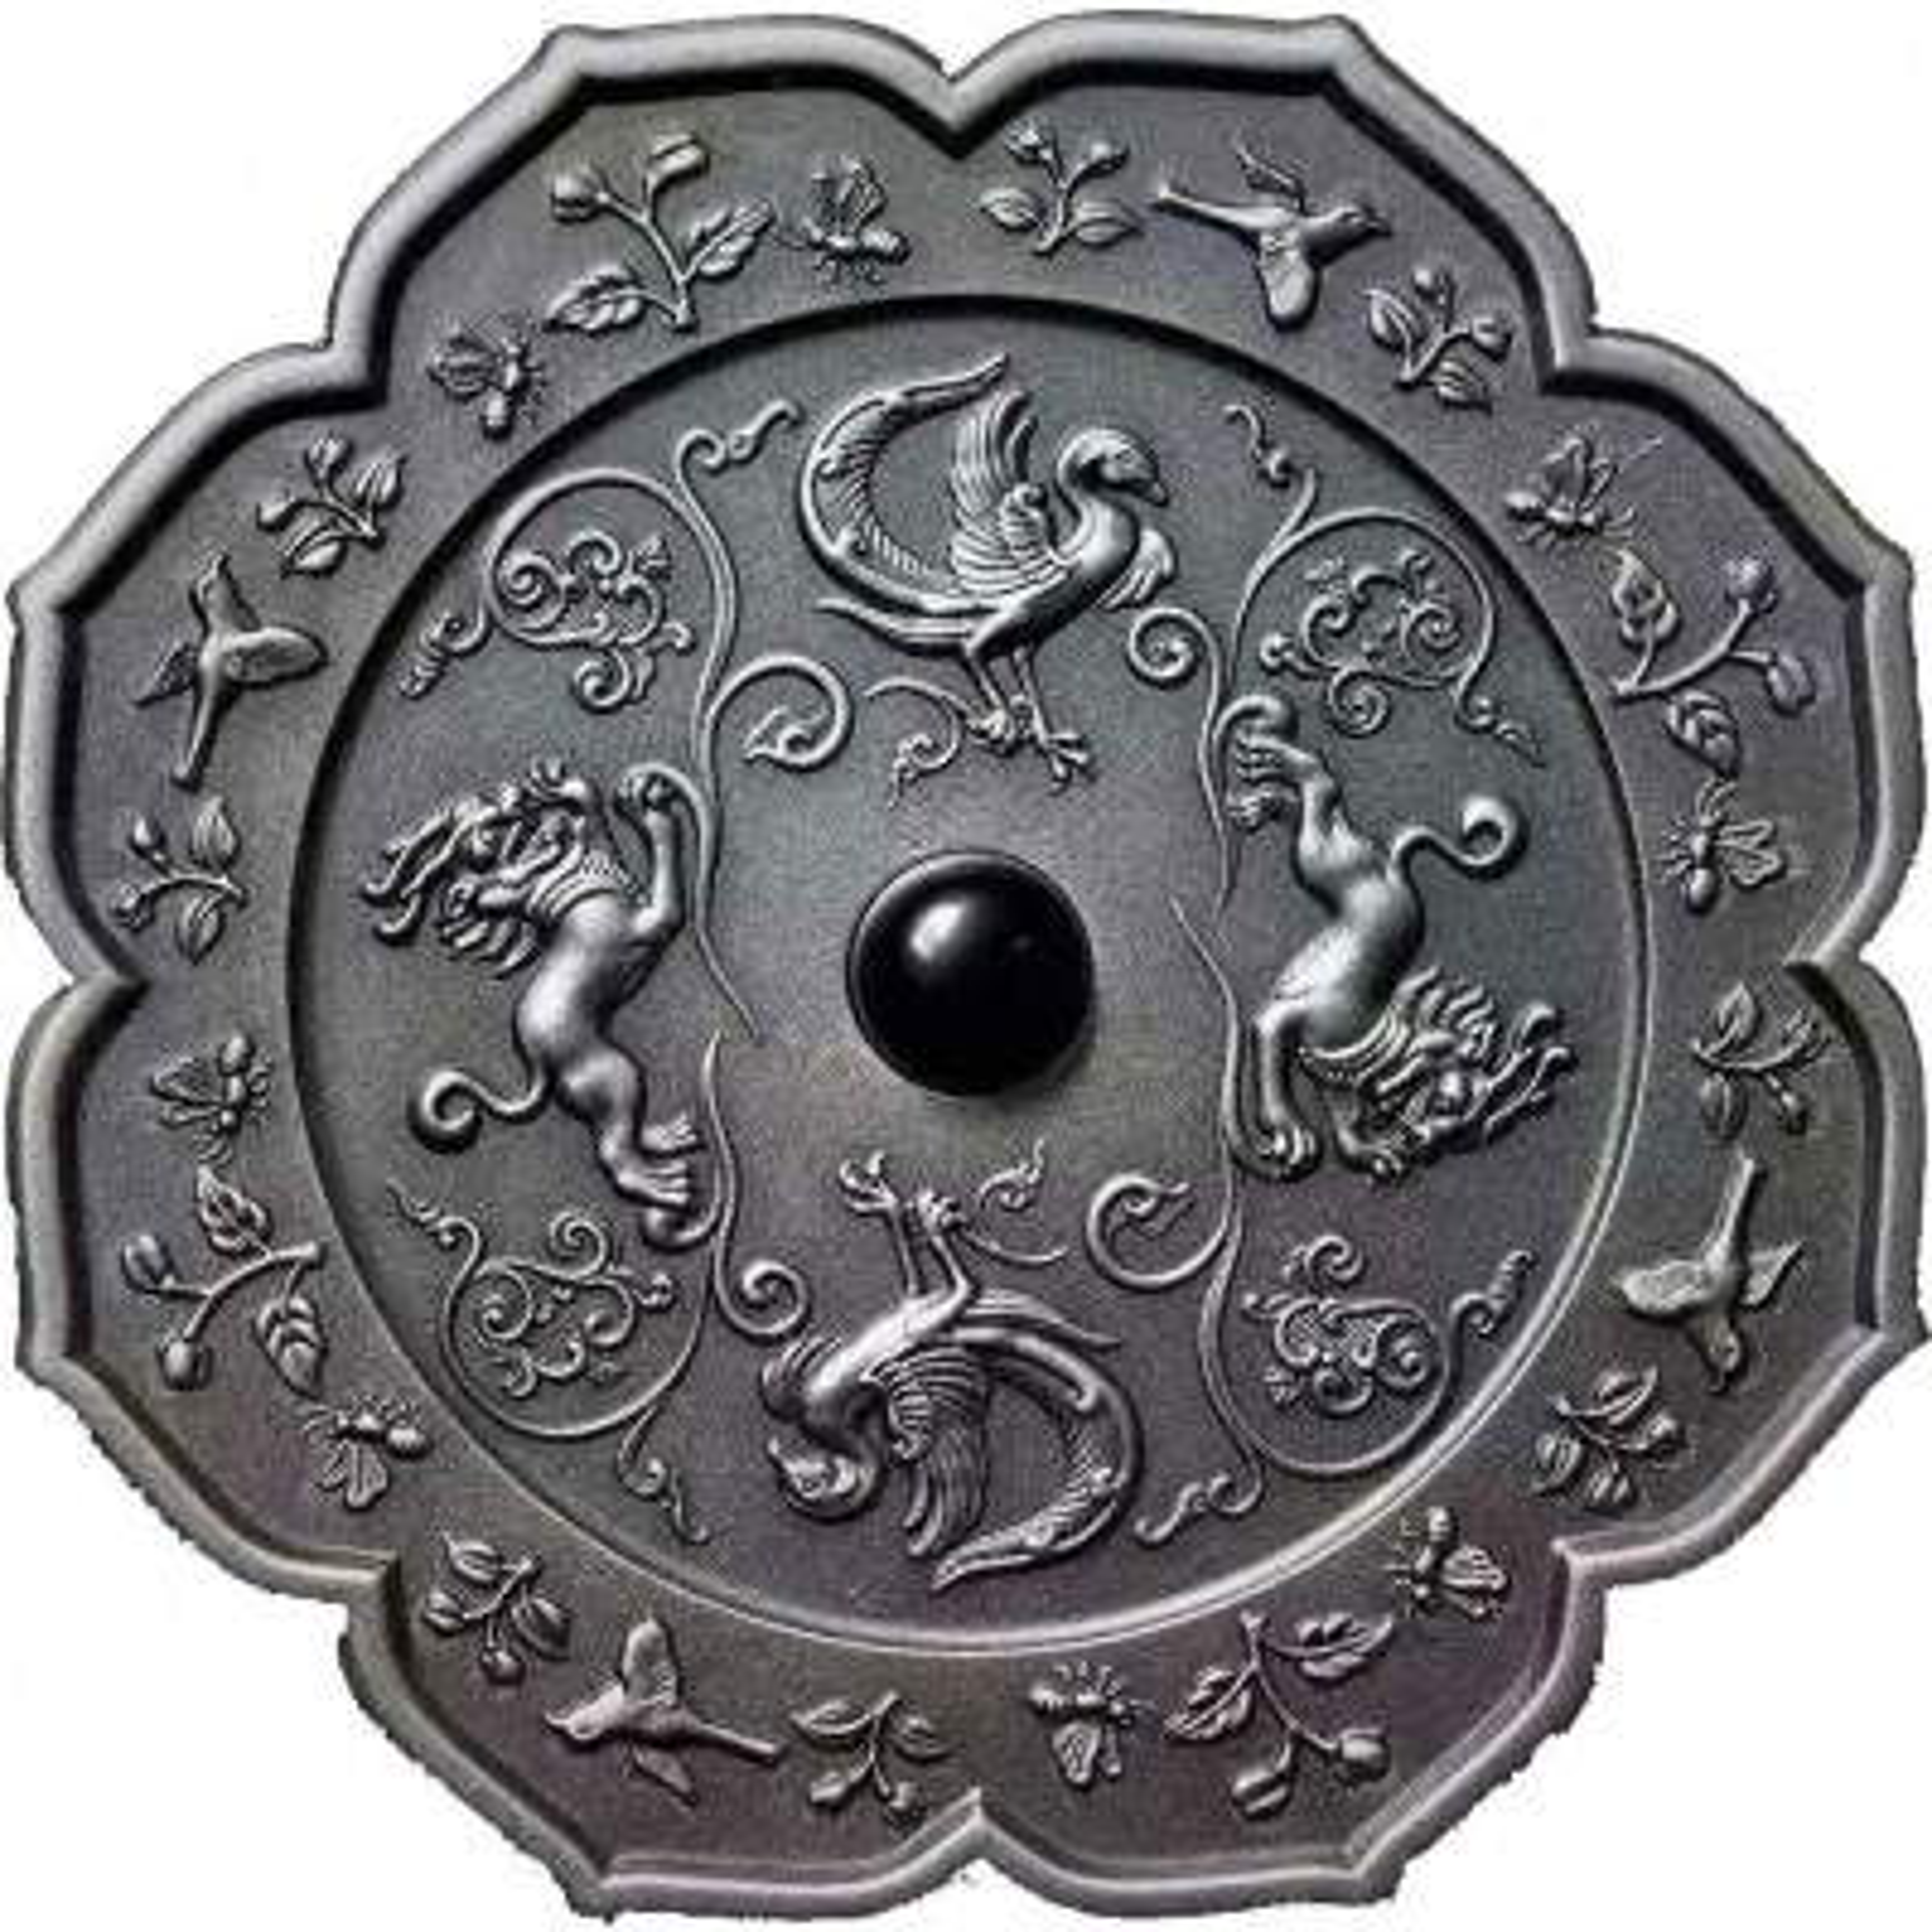 2 troy ounce zilveren munt Ancient Mirror Art 2021